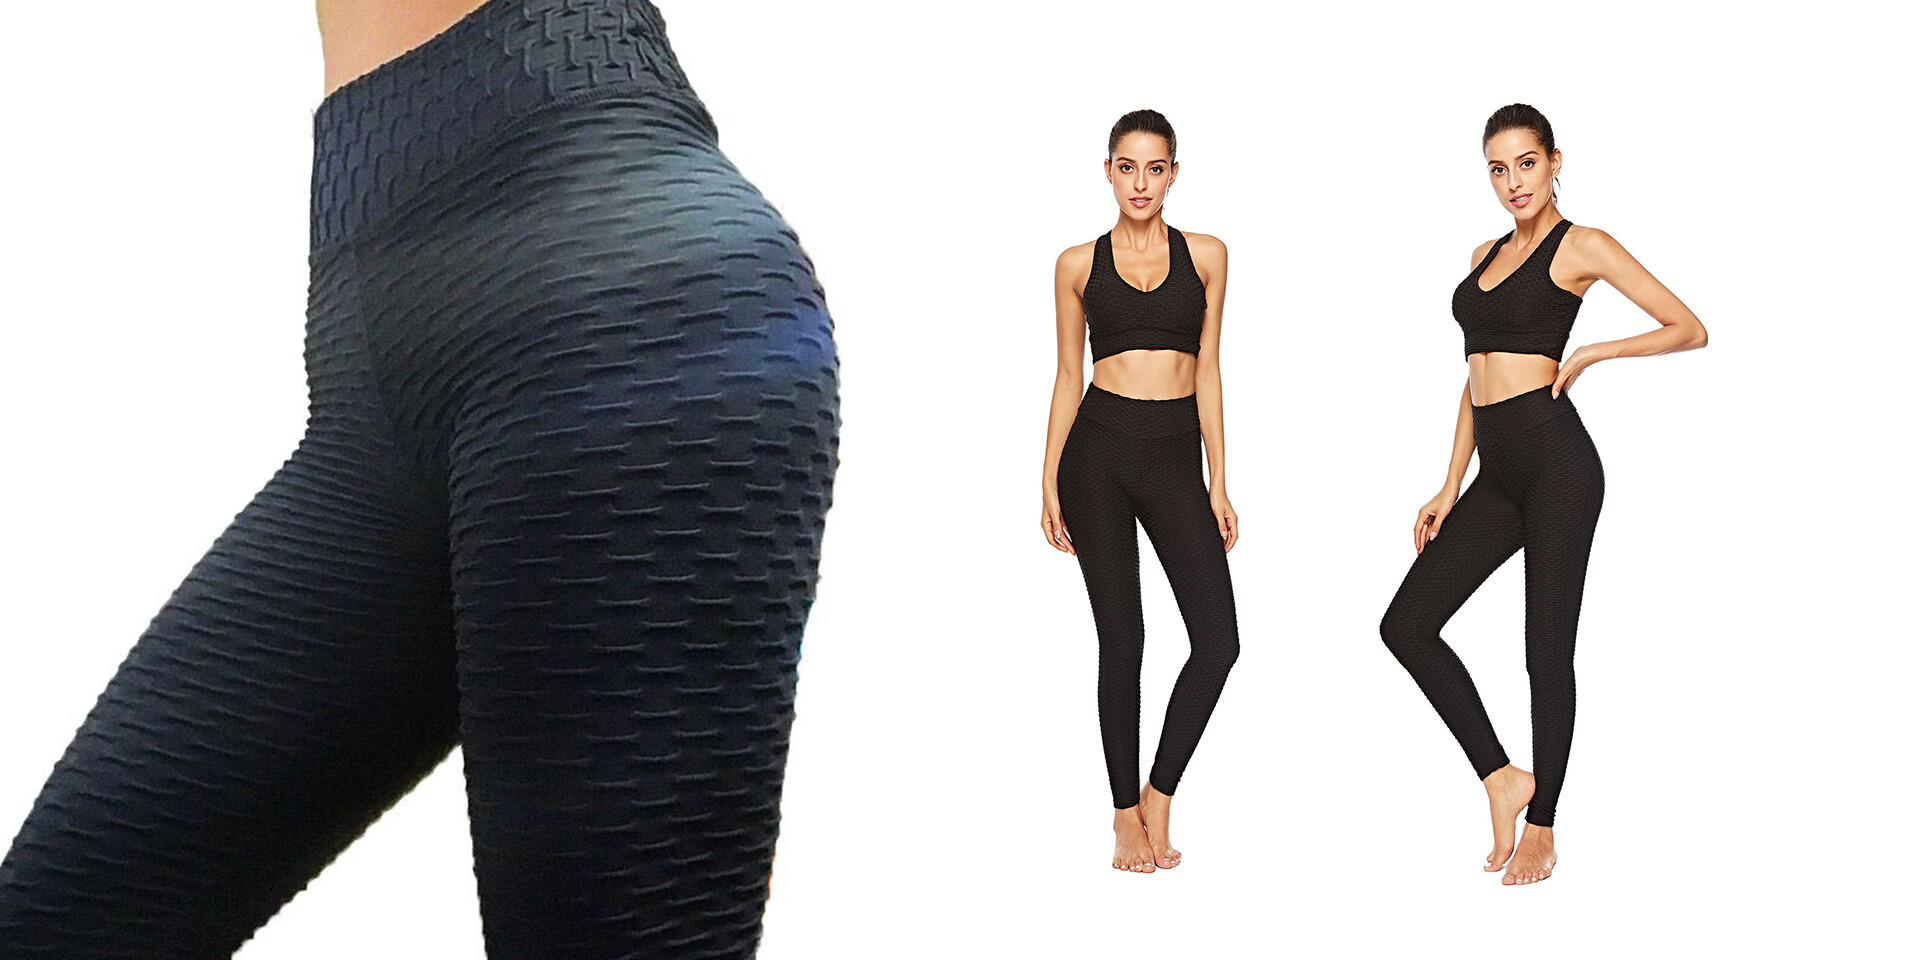 Legíny s účinkom proti celulitíde - Mega Fit Leggings